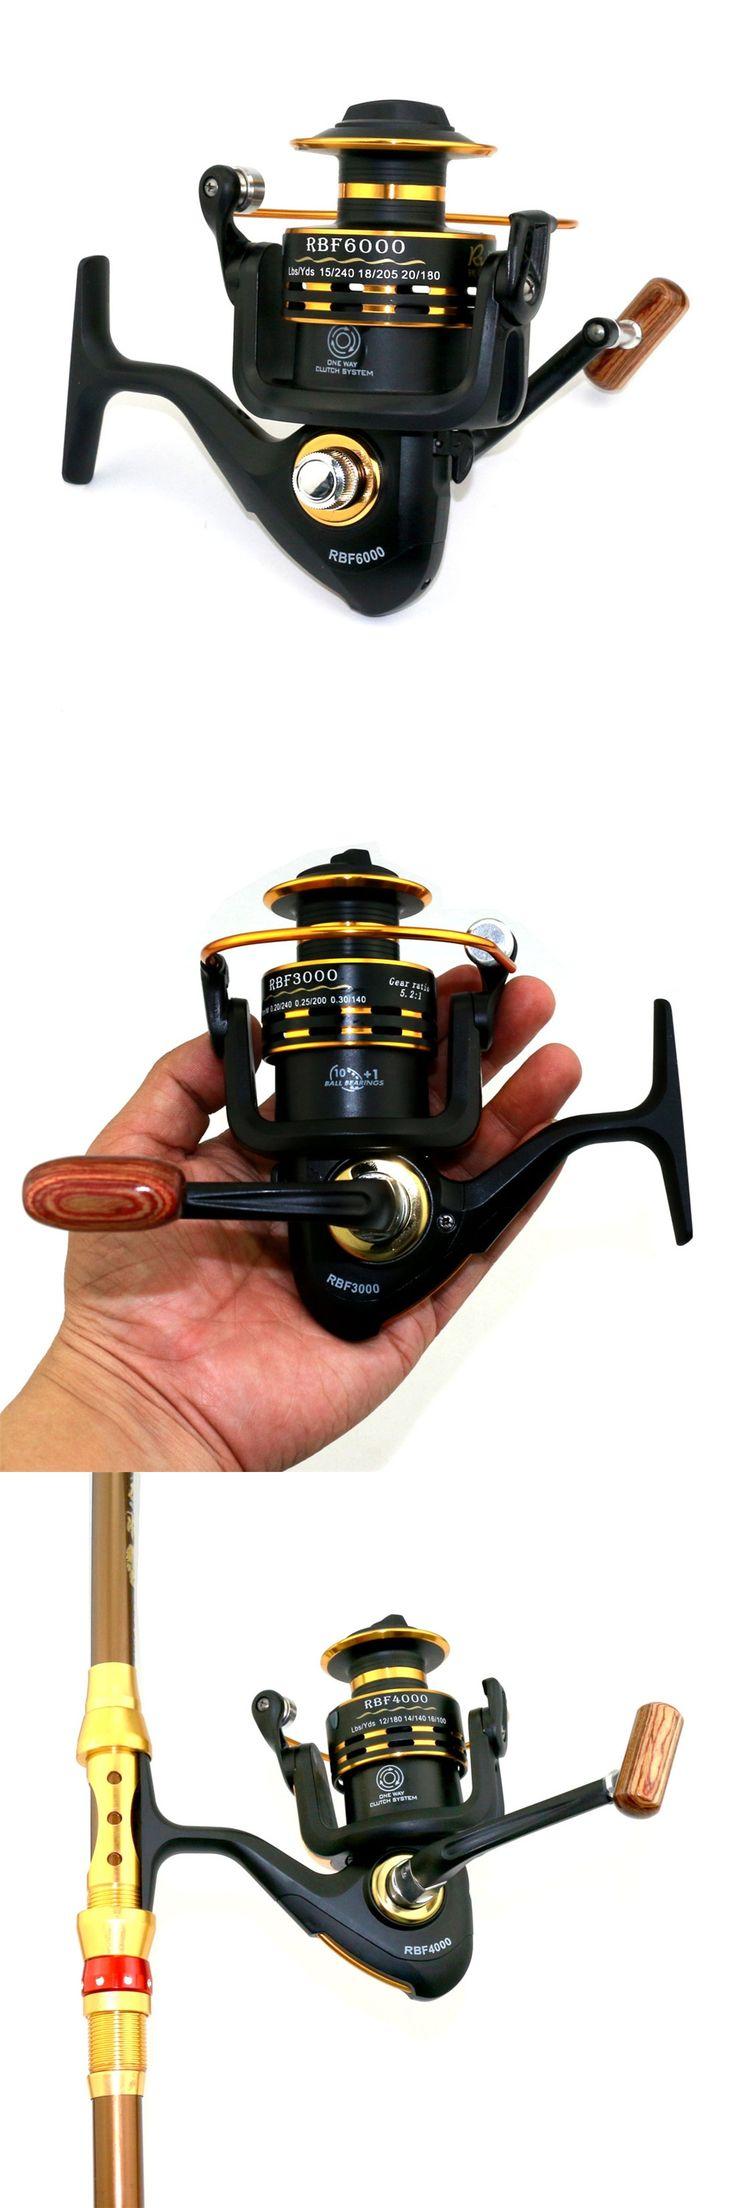 CALOFE Fishing Reel 11BB Fishing Spinning Reel Ratio 5.2:1 4.7:1 Two-way Spinning Reel Metal Baitcasting Fishing Reels